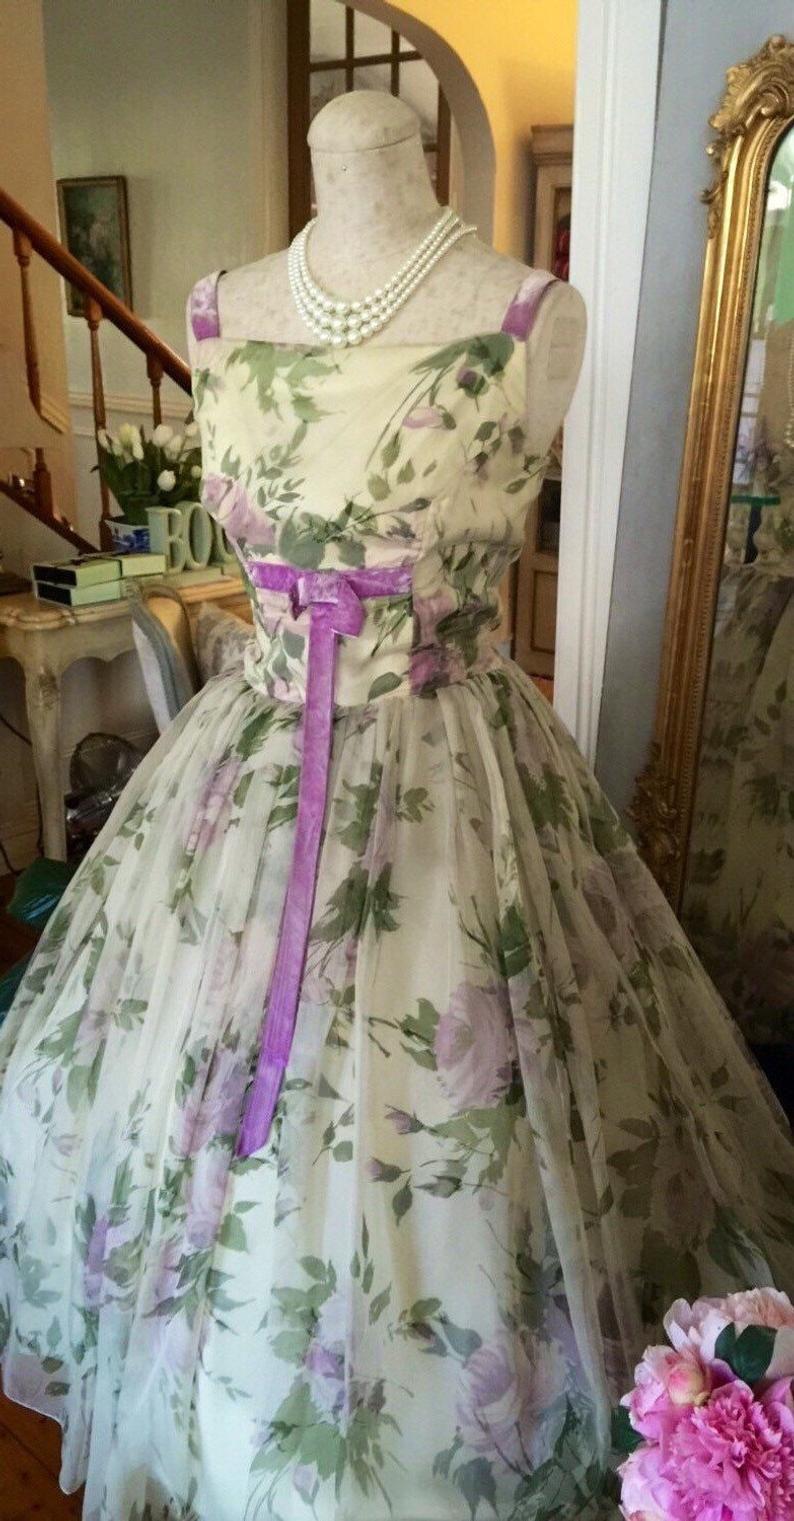 1950s Wedding Dress 50s Vintage Party Dress Purple Mauve Etsy In 2021 Vintage Party Dresses Vintage Dresses Evening Dresses Vintage [ 1521 x 794 Pixel ]